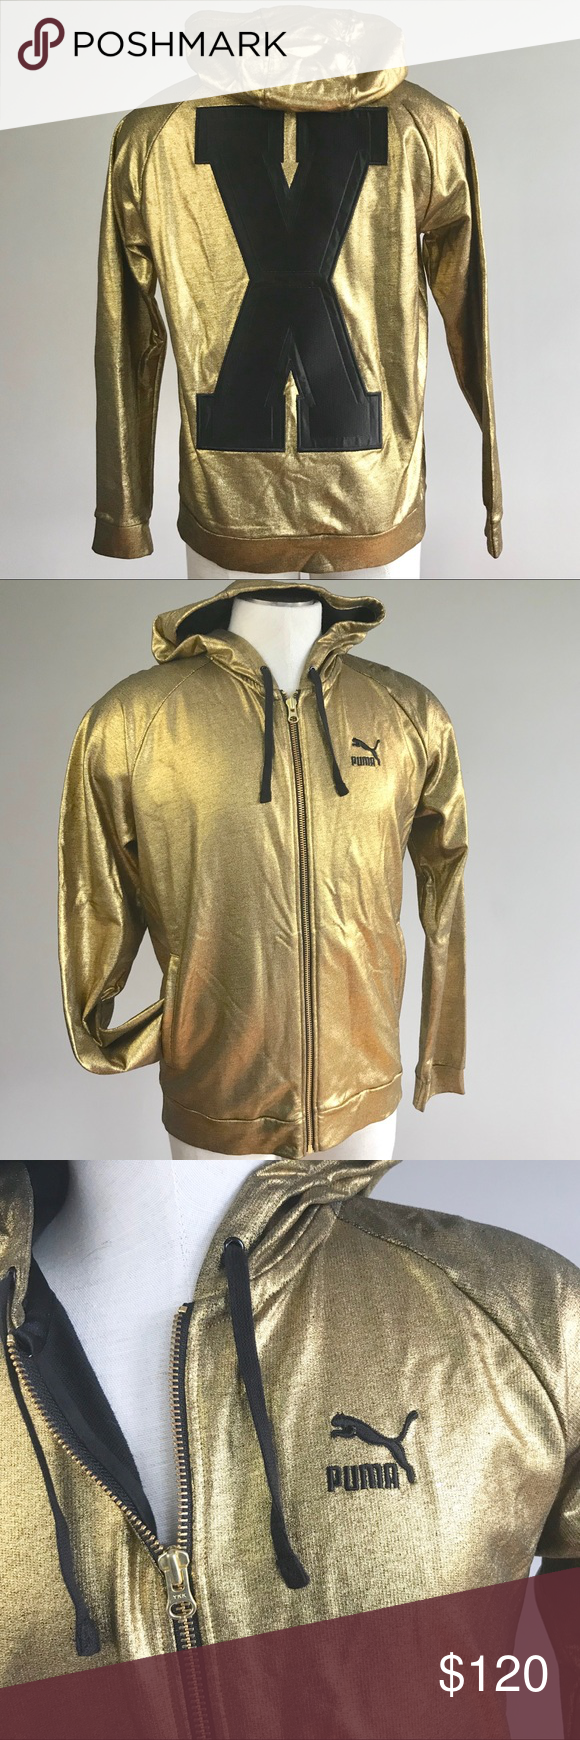 Puma X Vashtie Men Gold Logo Hoodie Track Jacket Puma X Vashtie Mens Logo Hoodie Track Jacket Size Medium 568731 Gold Jacket Track Jackets Hoodies Gold Jacket [ 1740 x 580 Pixel ]